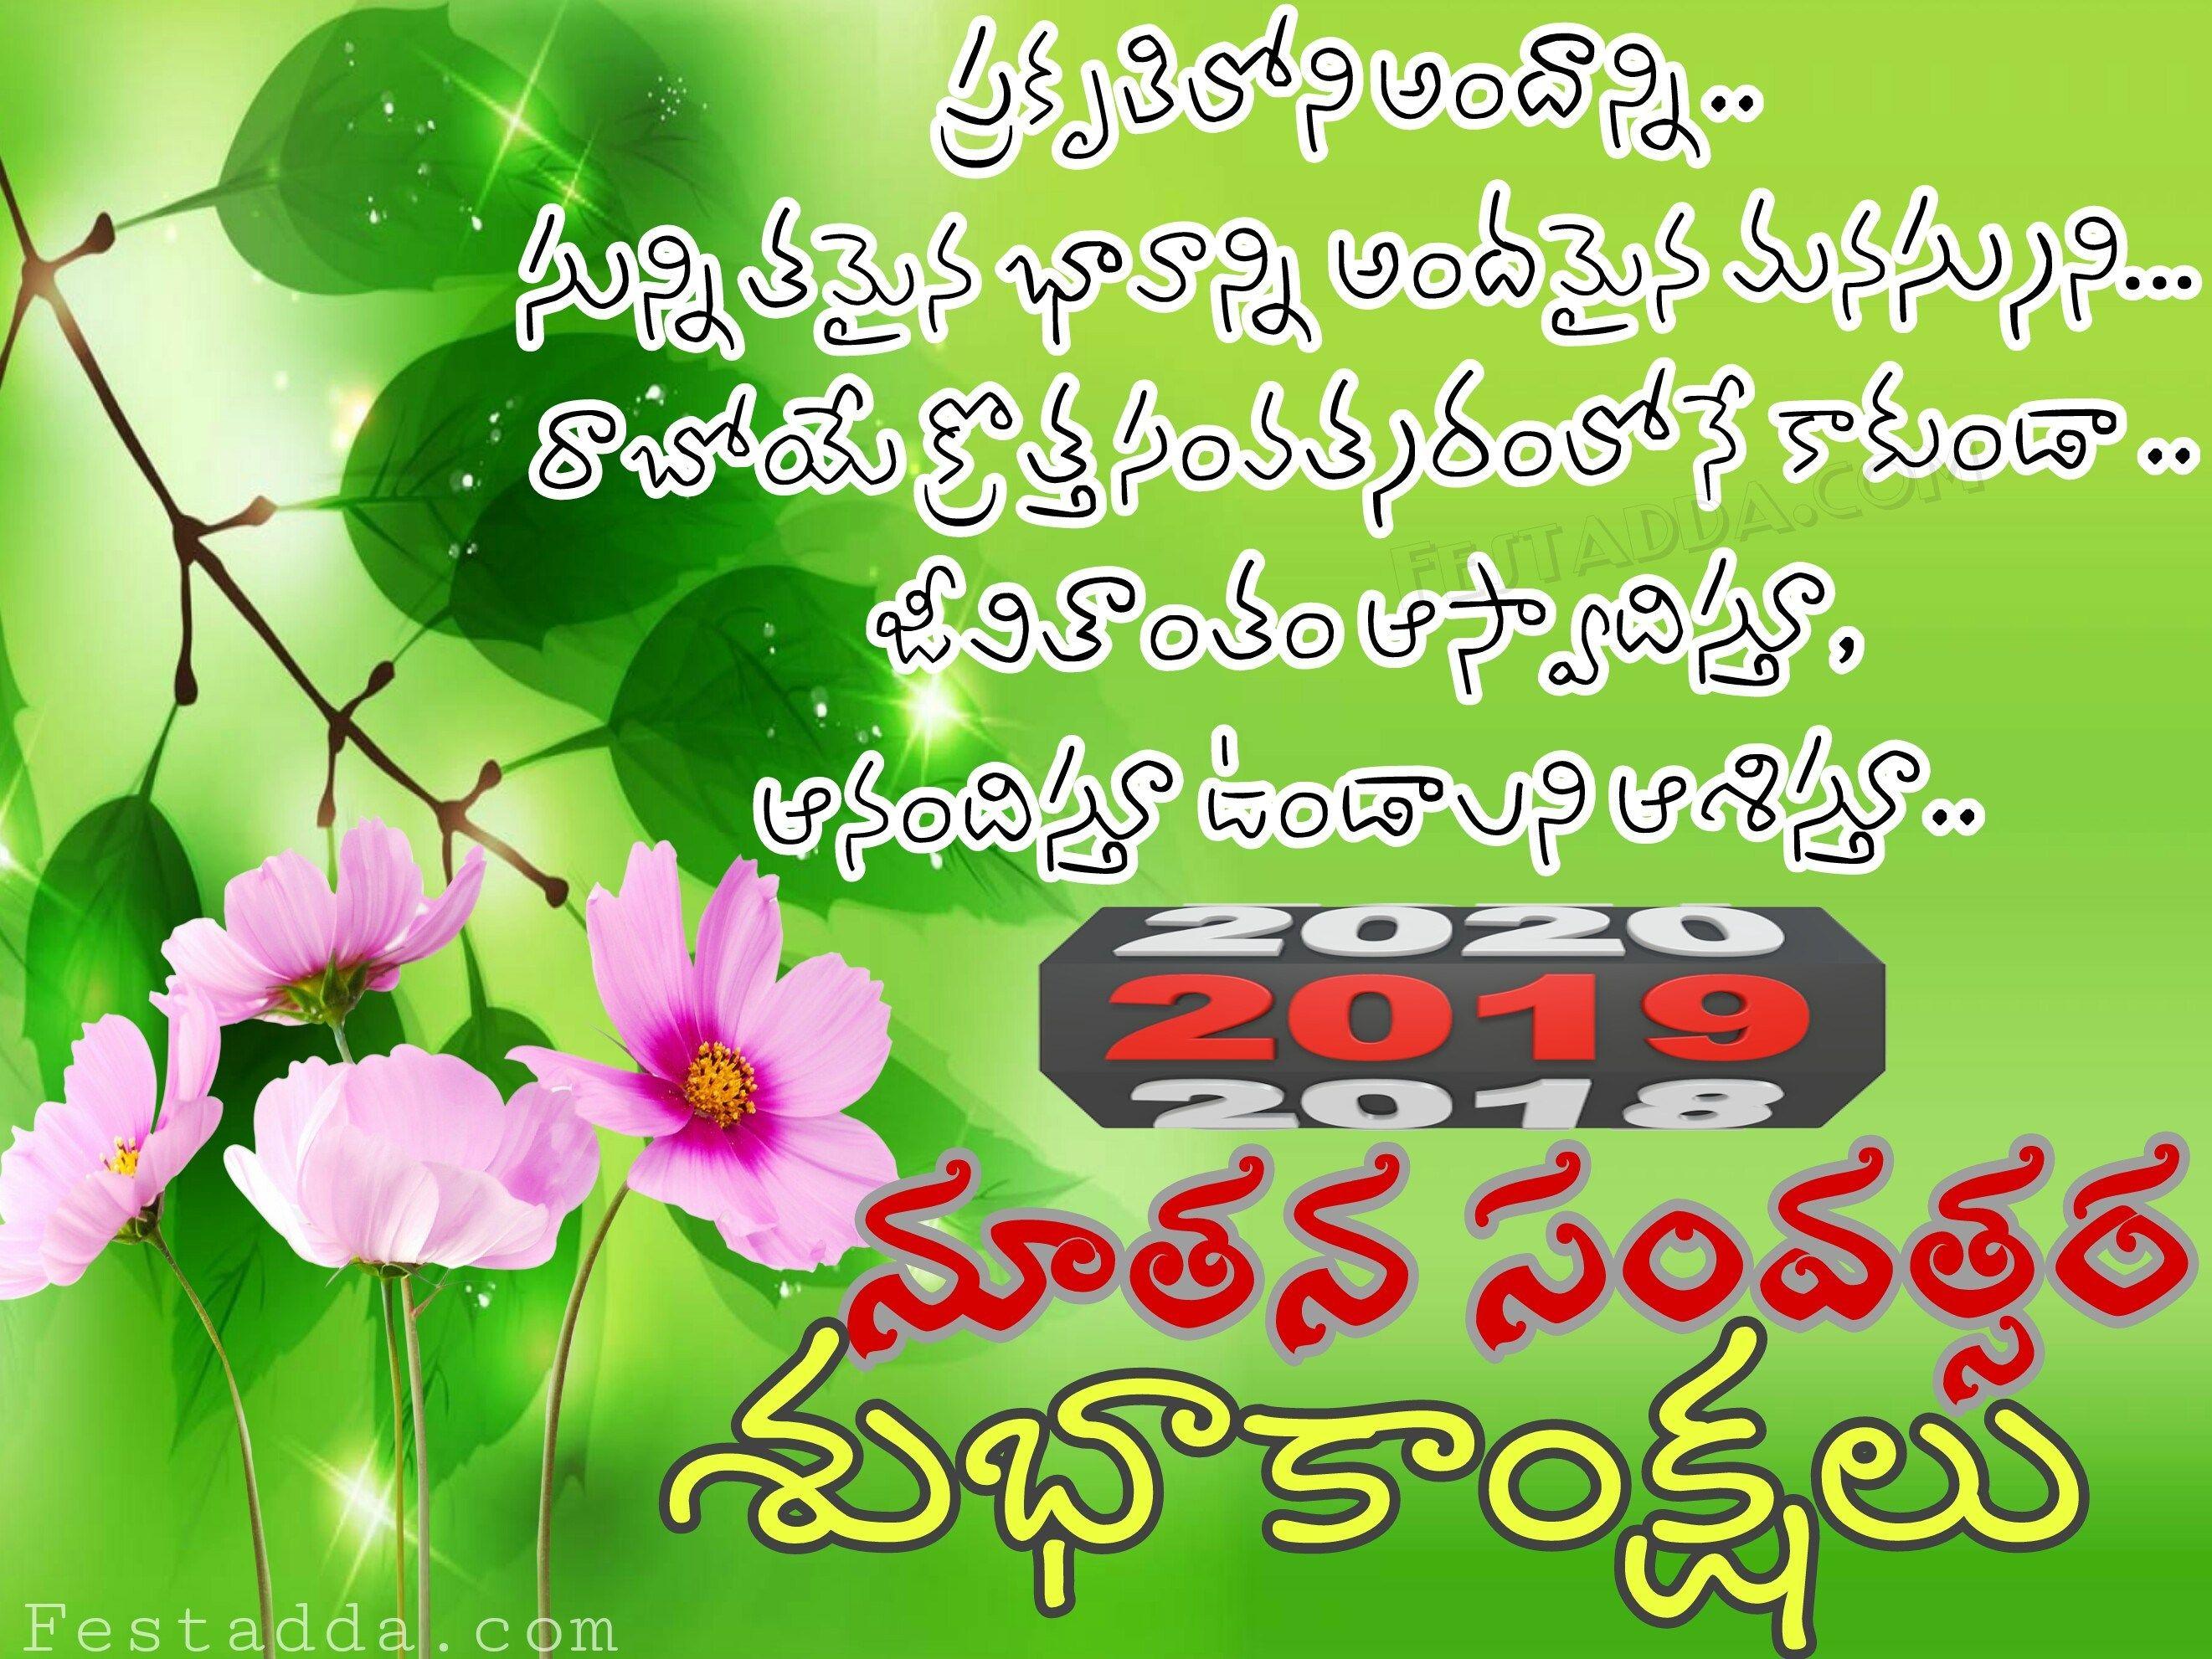 Nuthana Samvatsara Subhakankshalu Photos Images Wallpapers Full Hd New Year Wishes Images Happy New Year Quotes Wishes Images